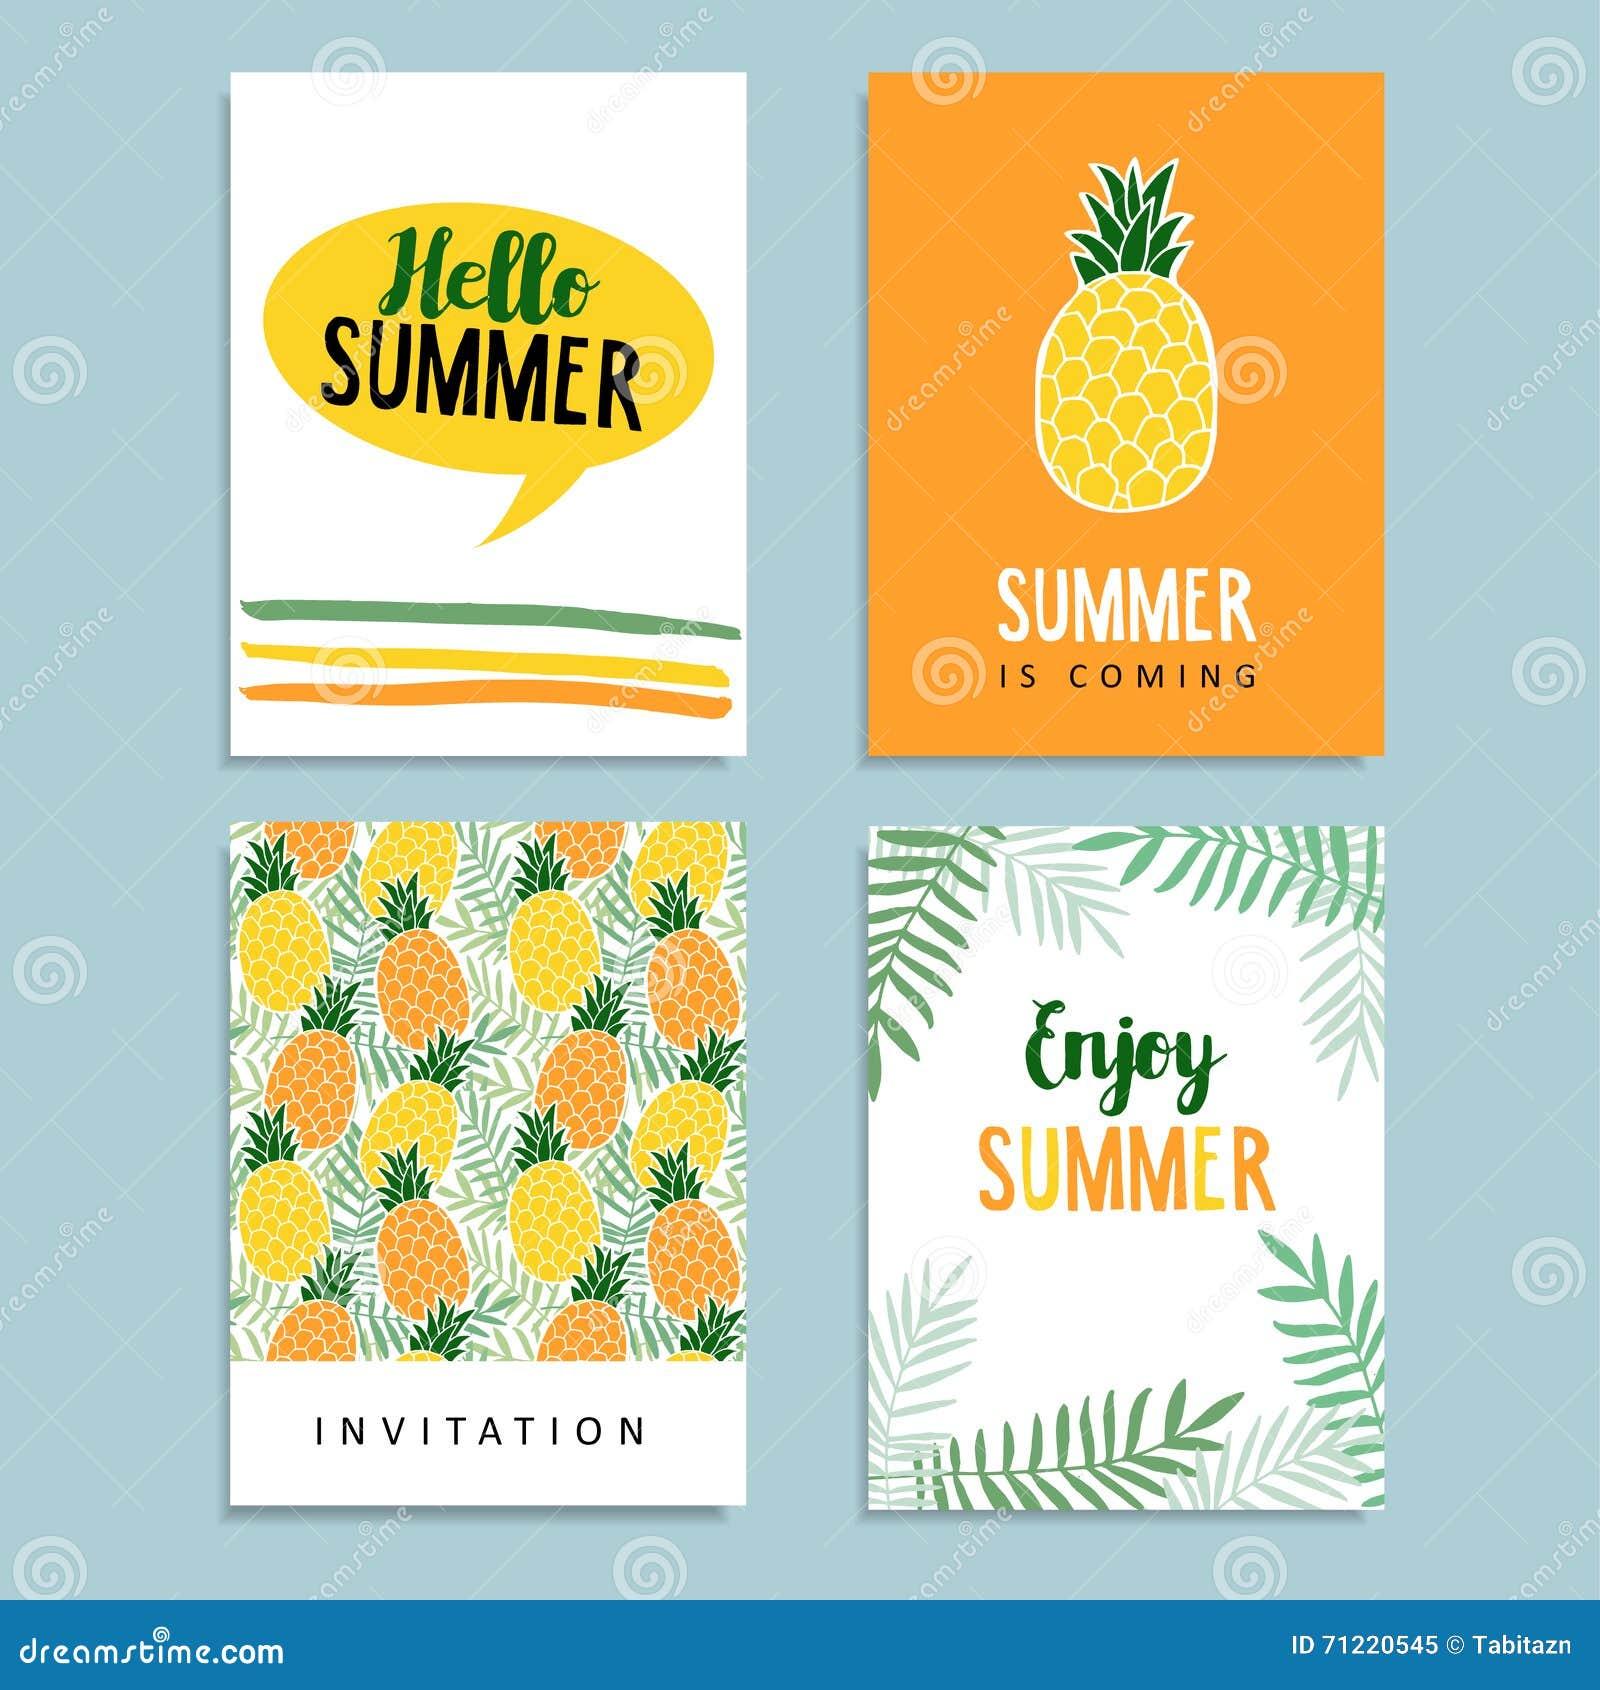 Creative Birthday Invitation with great invitations design